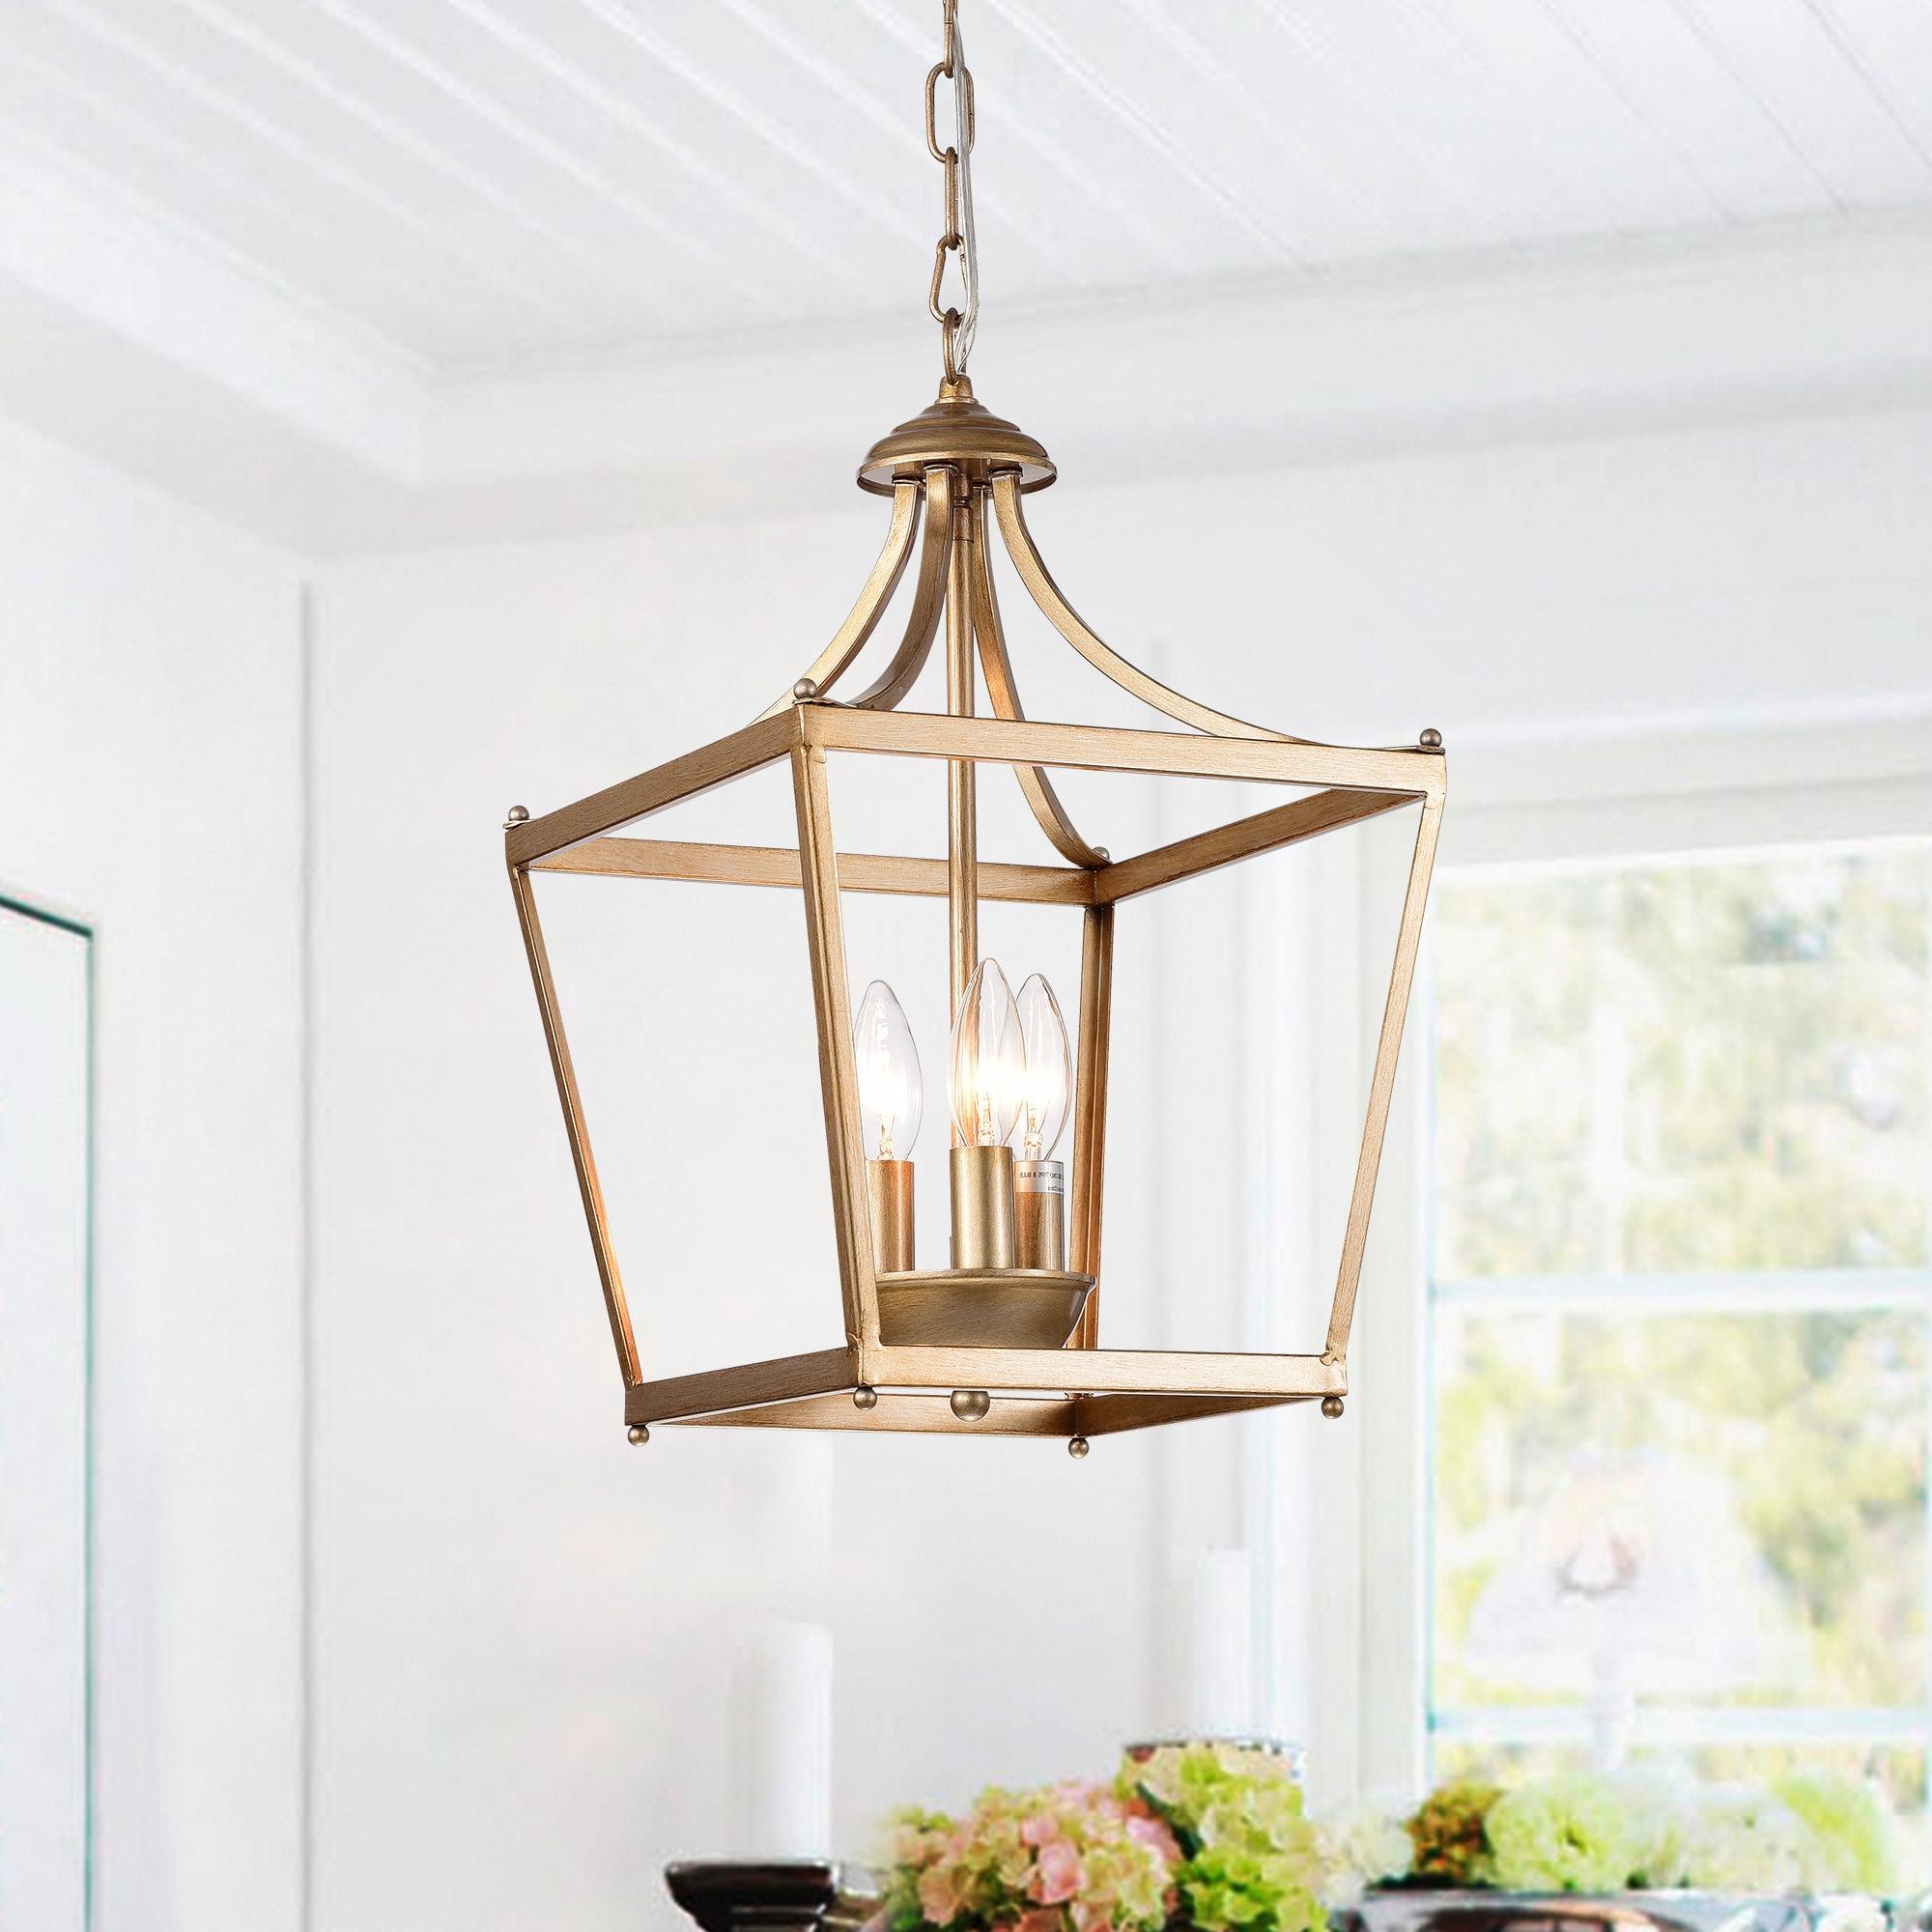 Famous Destrey 3 Light Lantern Square/rectangle Pendants With Regard To Warehouse Of Tiffany Sunsus Gold 3 Light Lantern Pendant (11 (Gallery 17 of 20)